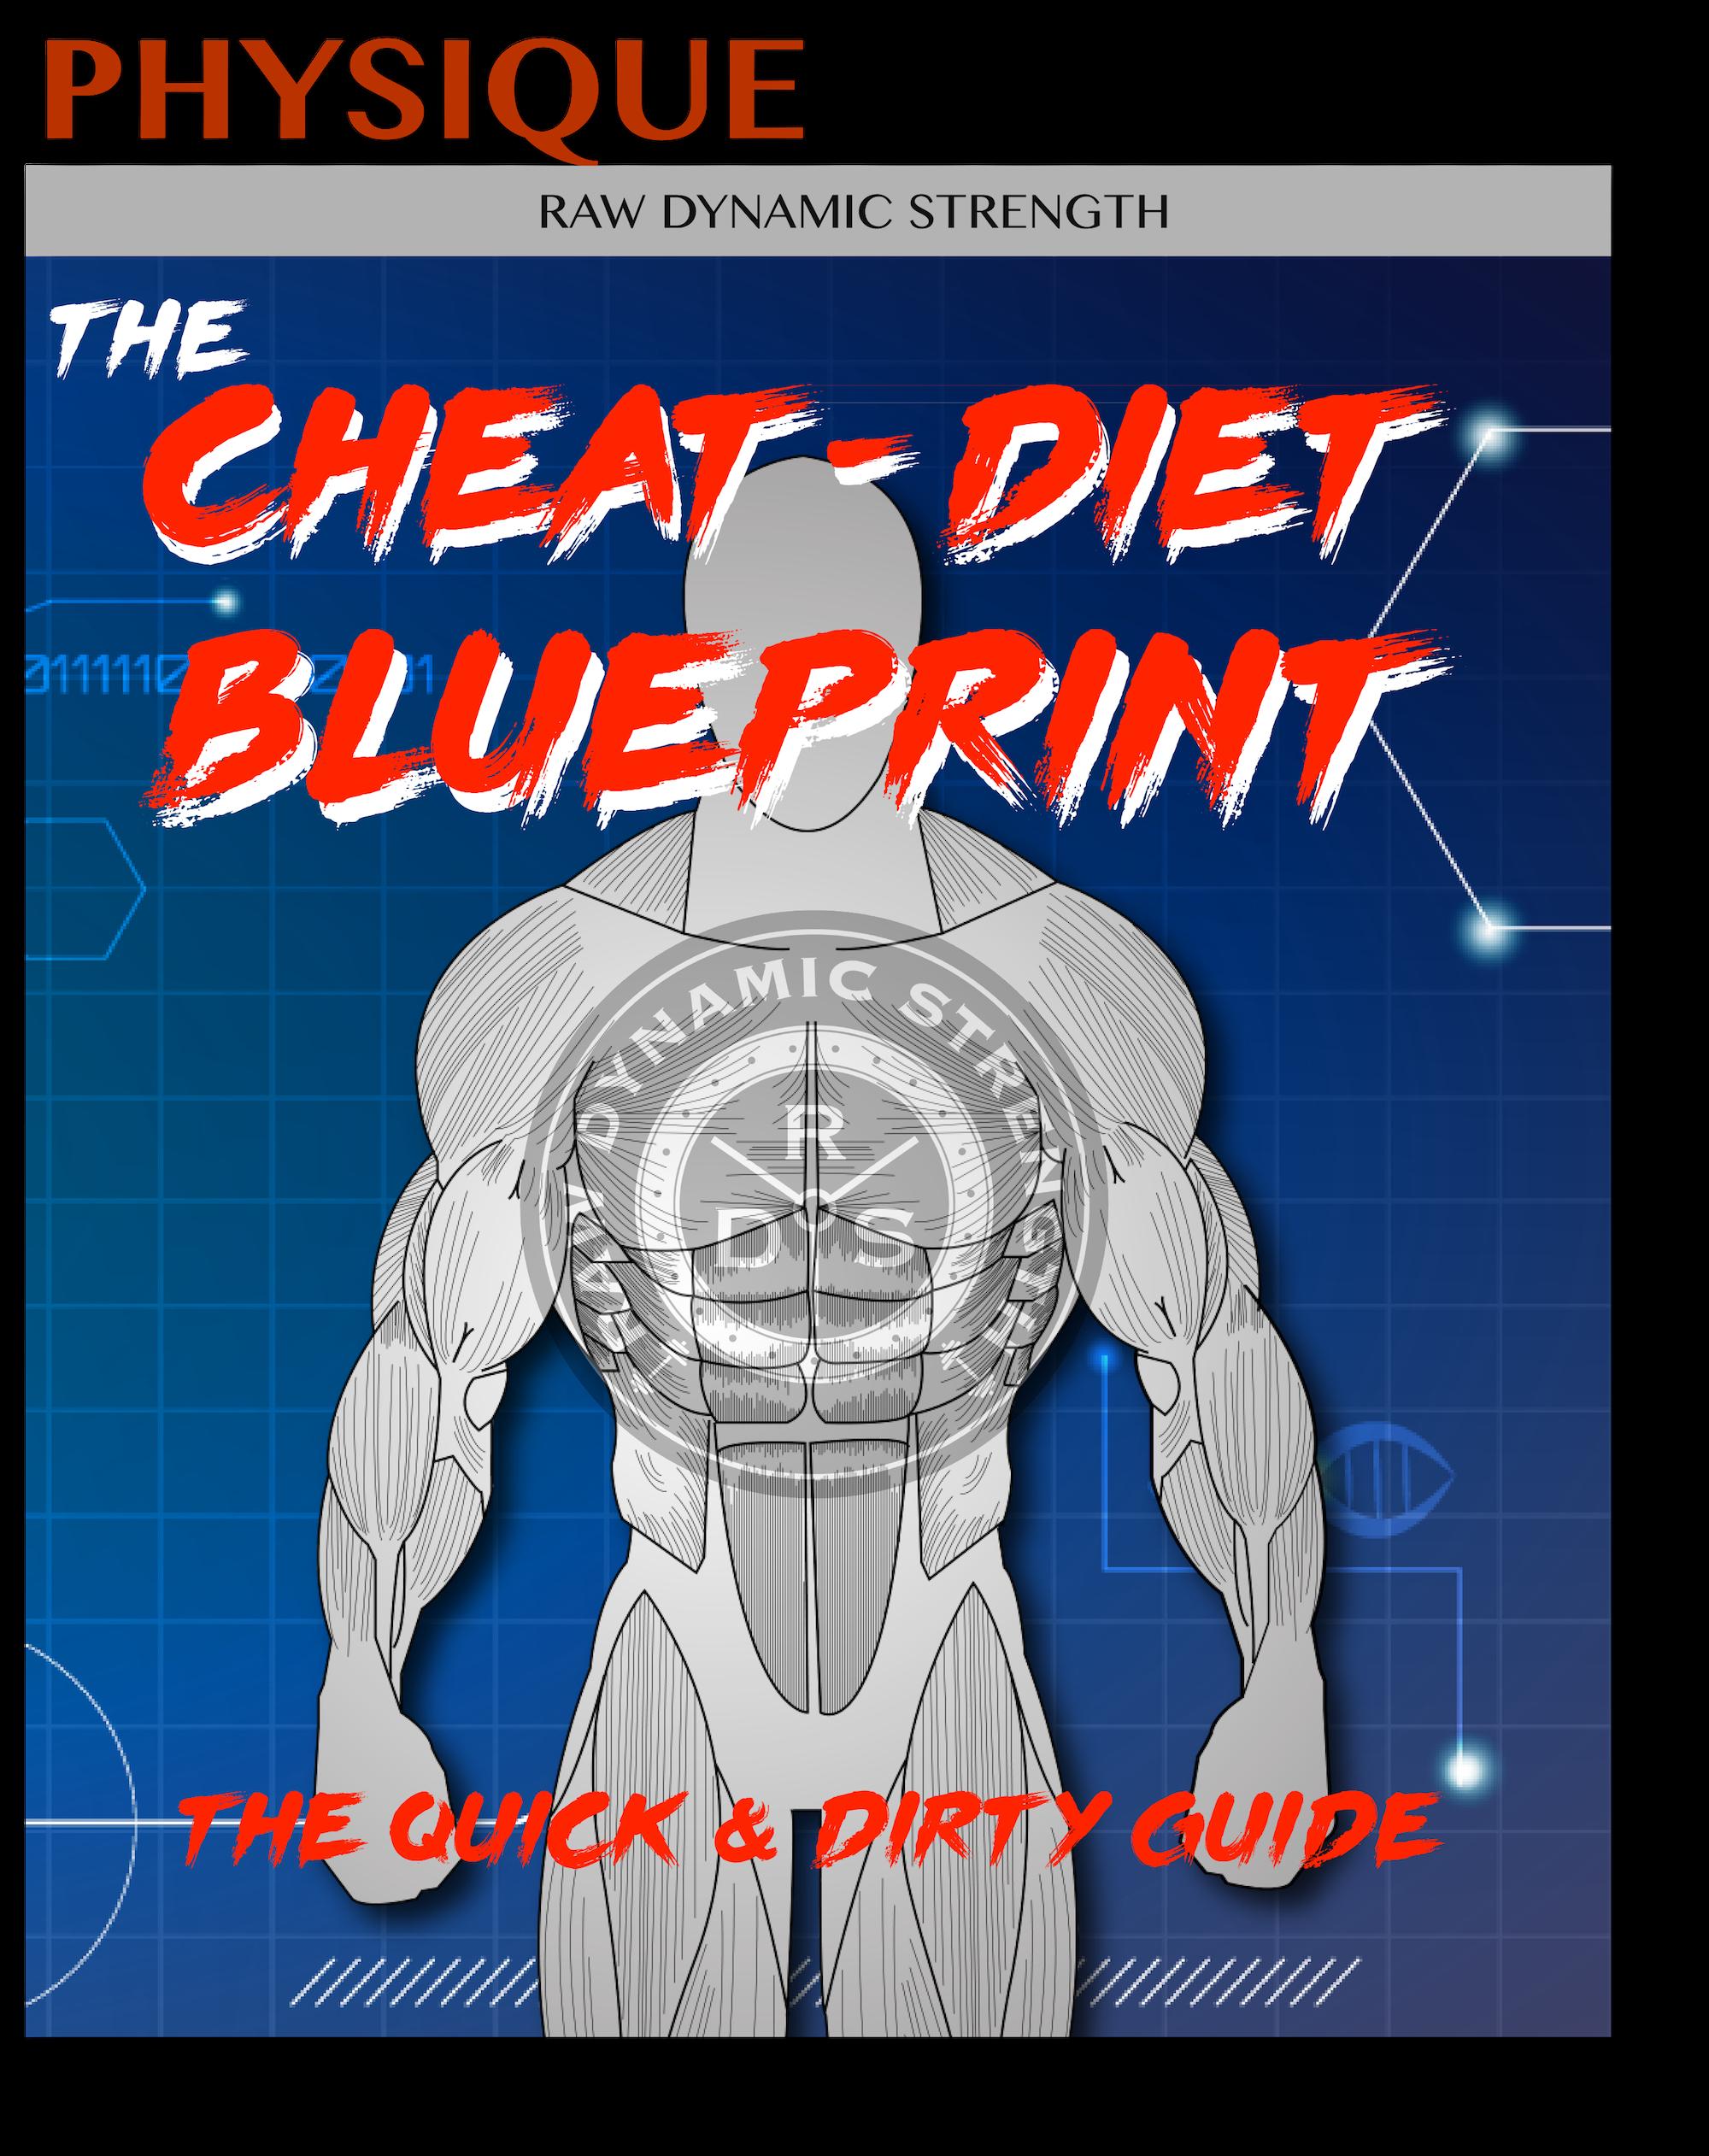 Cheat-Diet Blueprint1-01.png